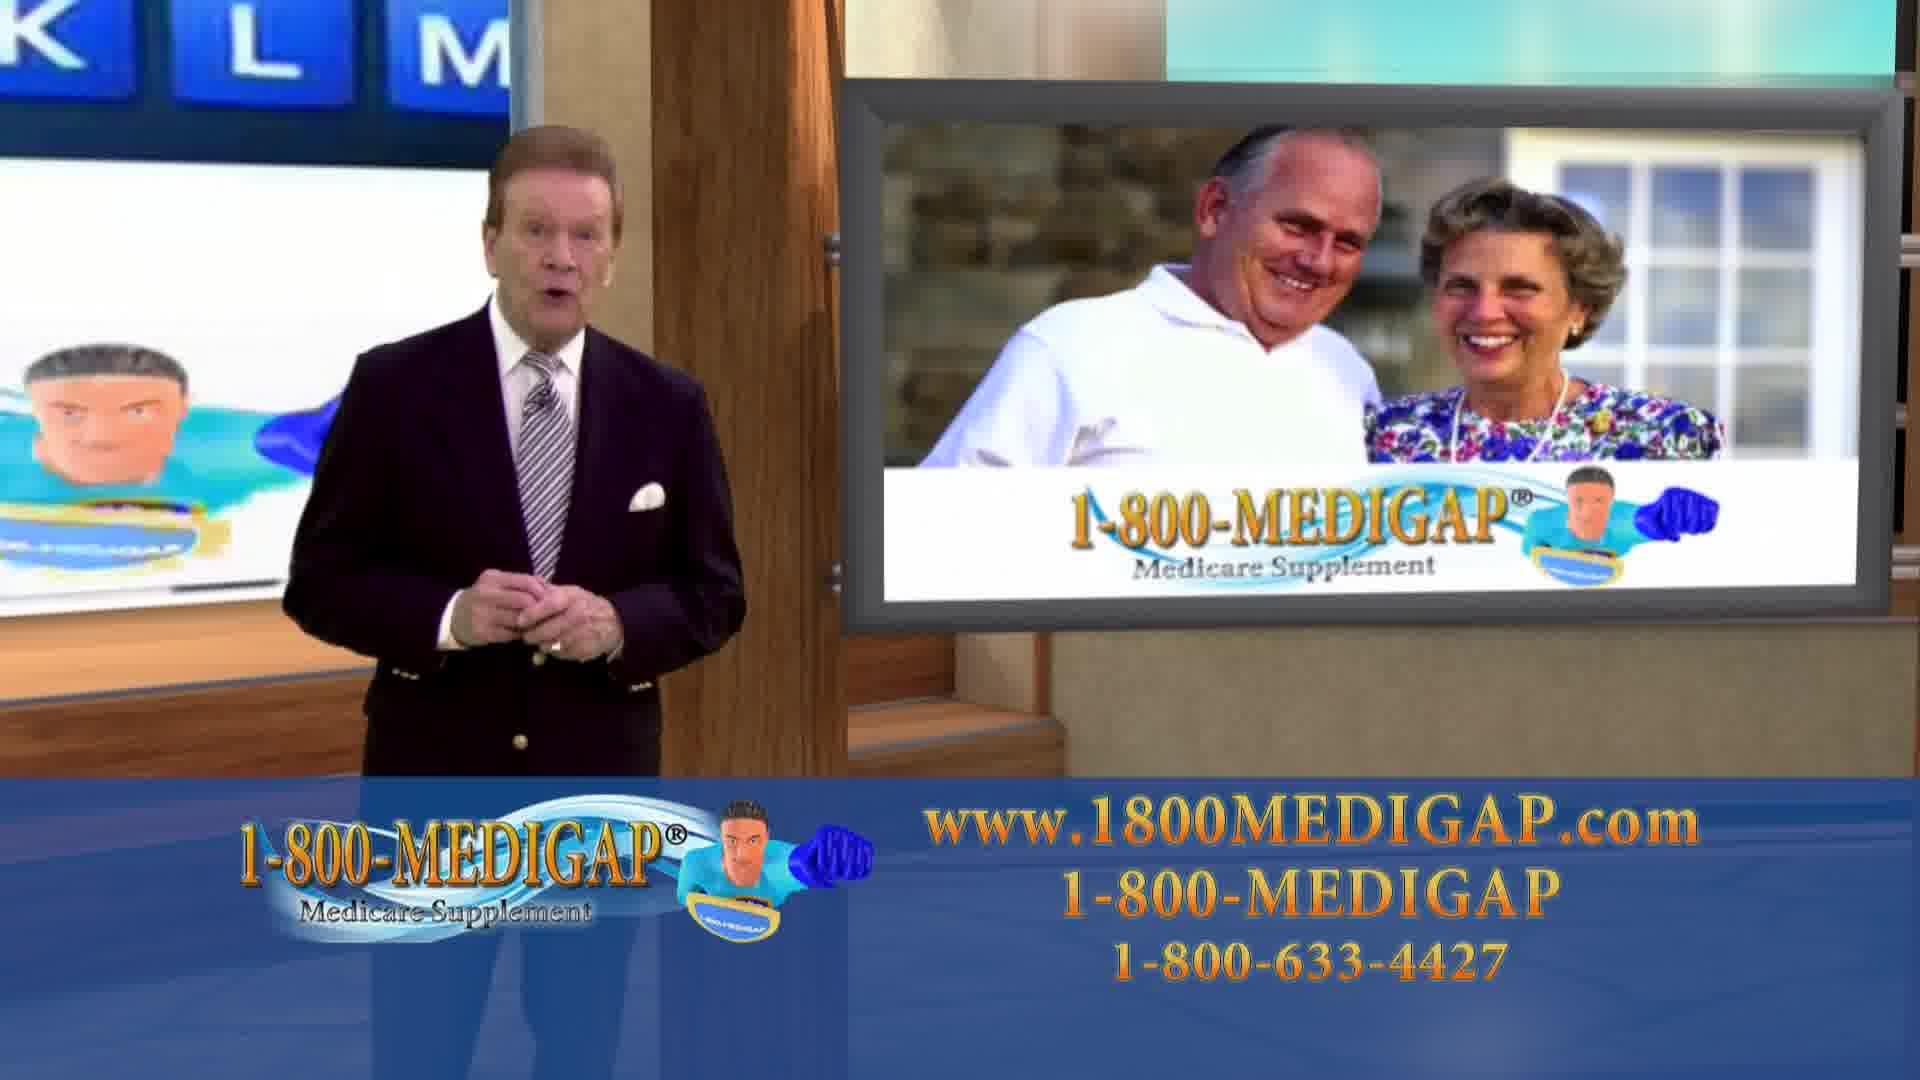 Medicare Supplemental Coverage Comparison